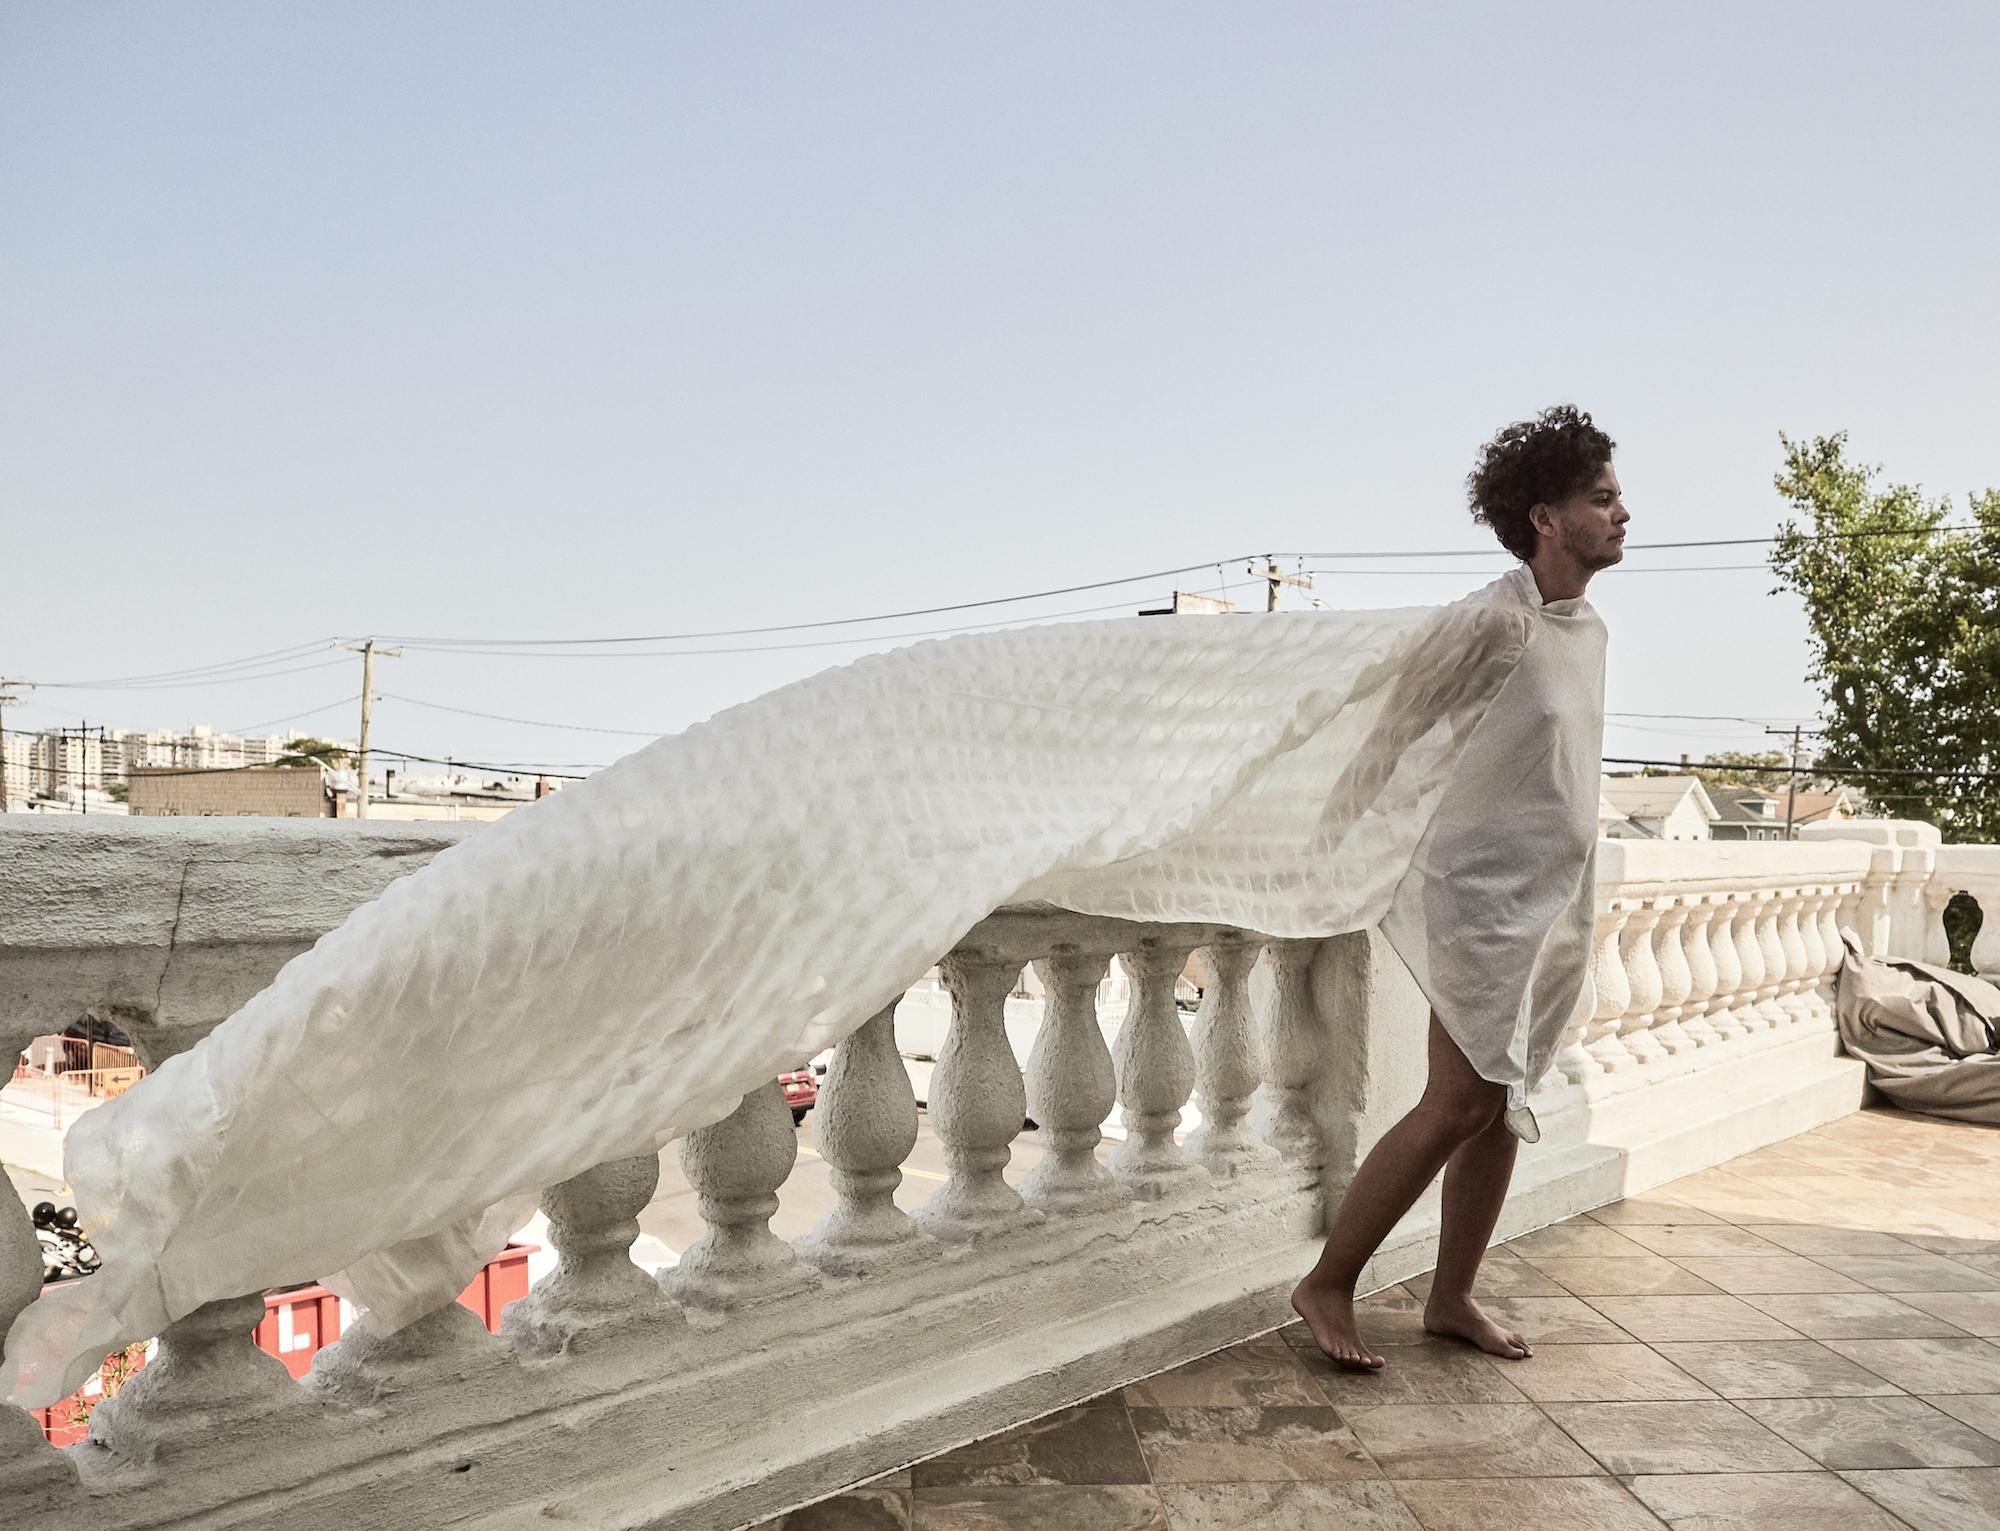 Photos by Arnaud Falchier